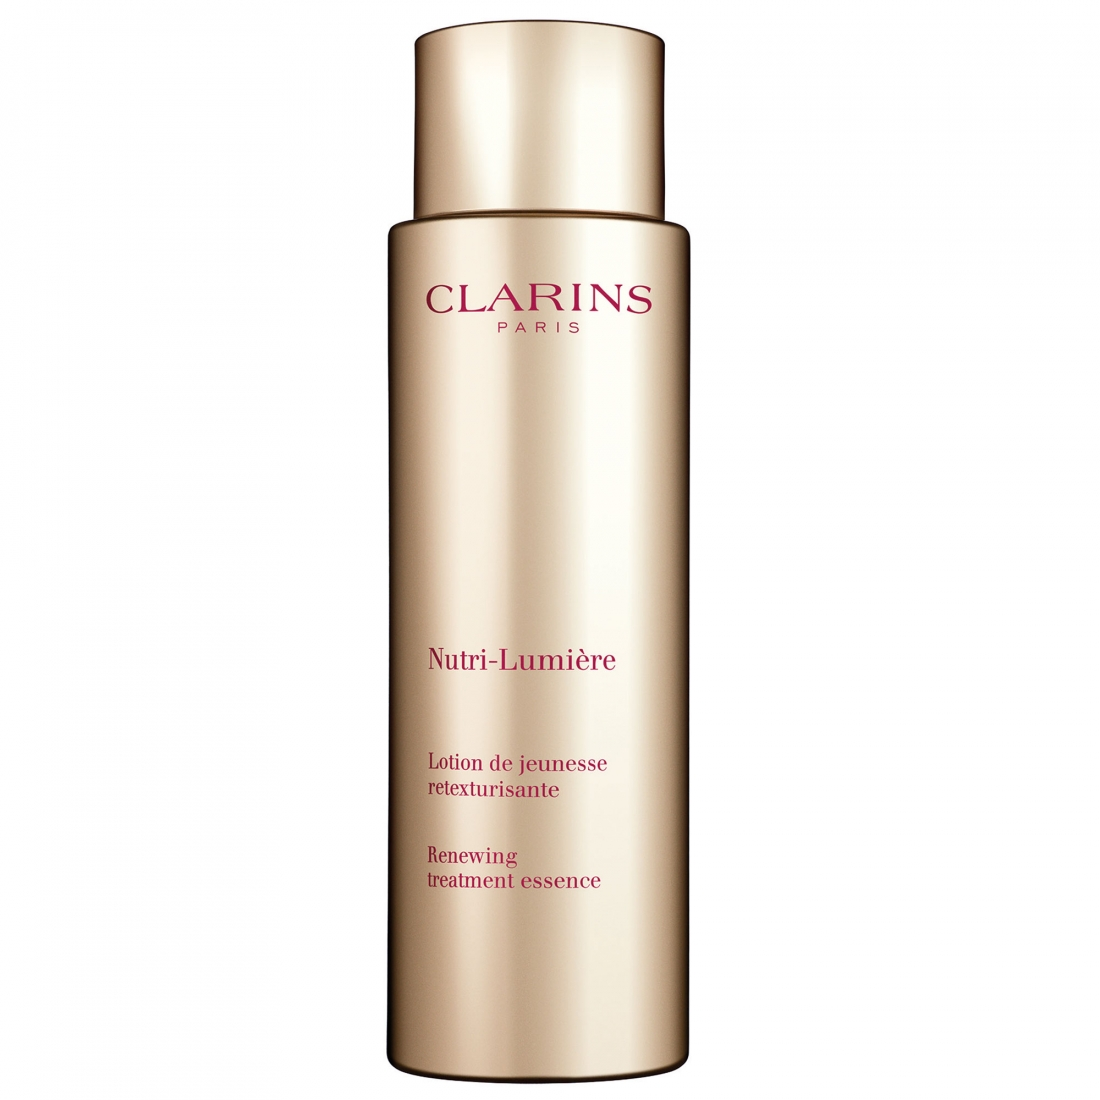 Clarins Nutri-Lumiere Treatment Essence